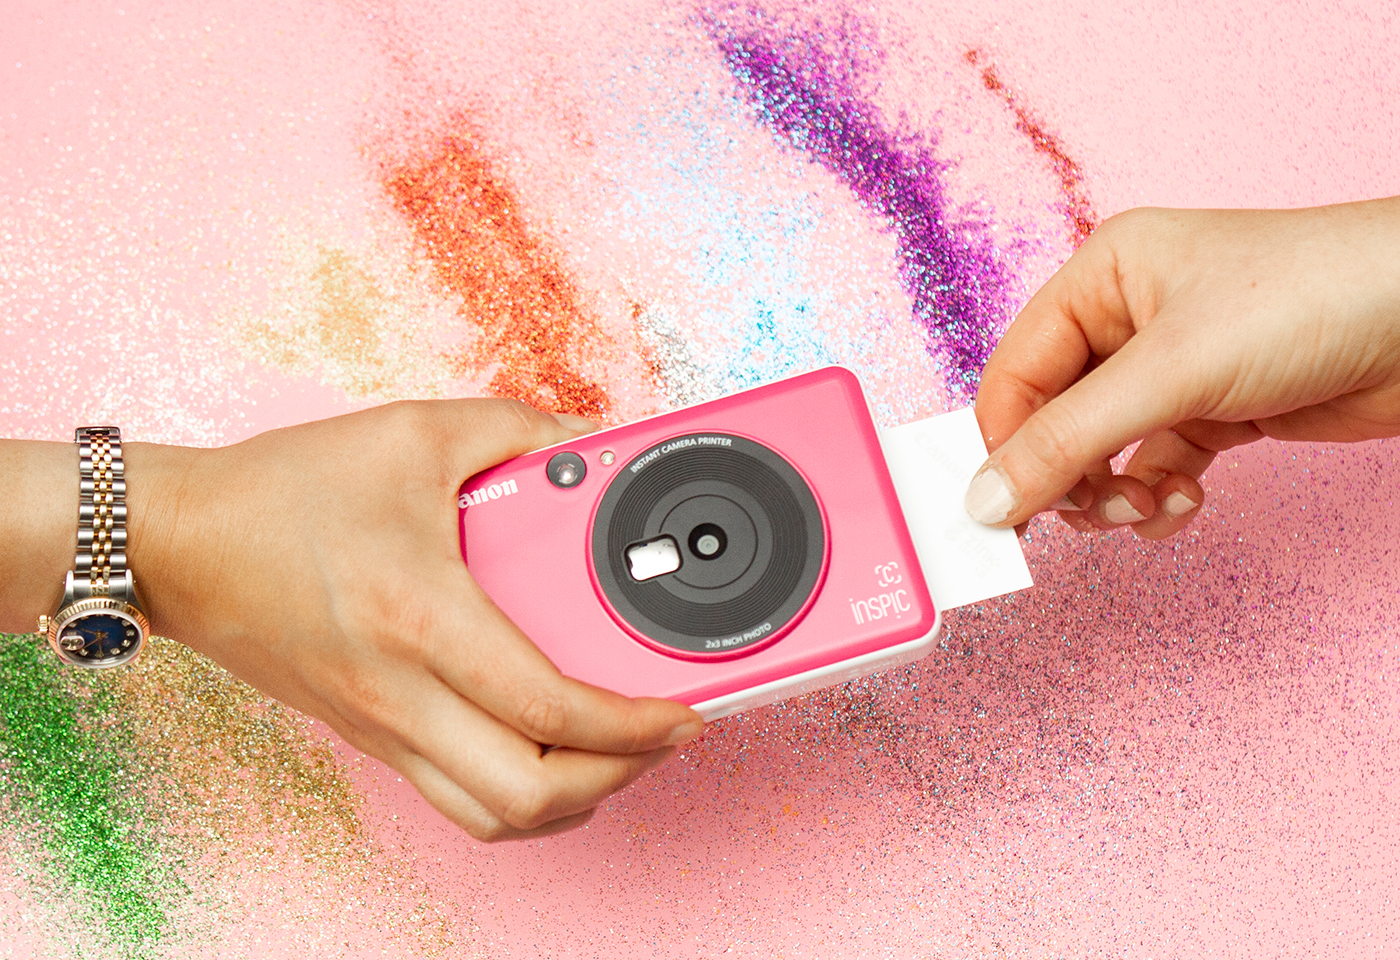 Inspic C Bubblegum Pink - easily reprint photos